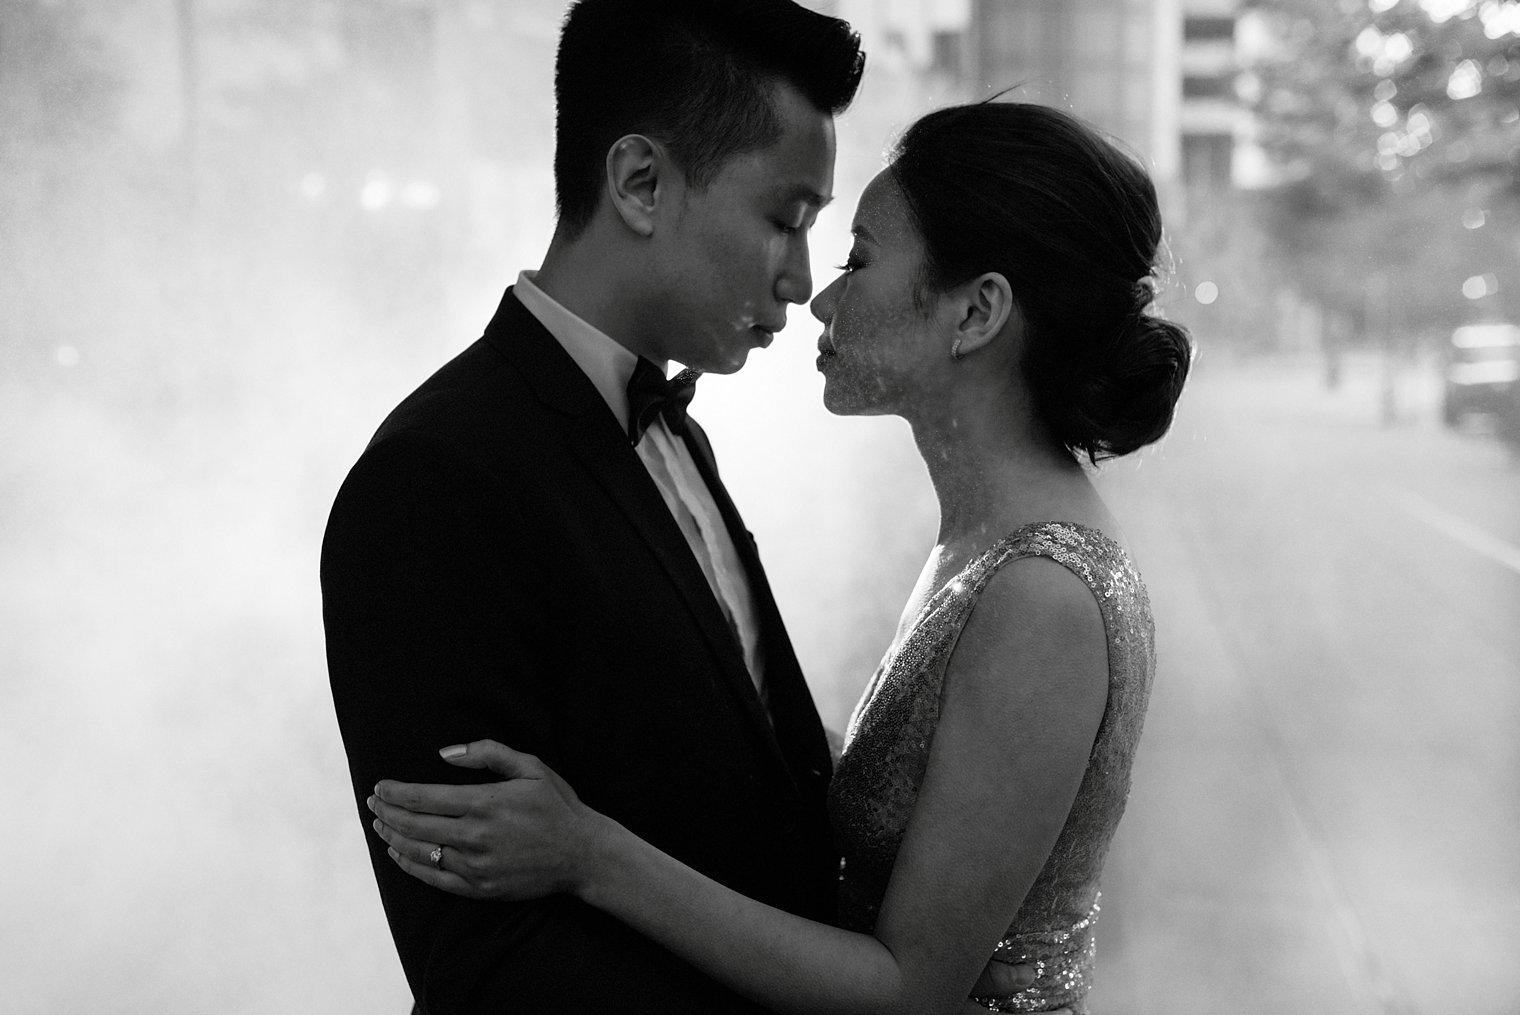 Engagement Portrait In Mist Downtown Vancouver Bc Vancouver And Destination Wedding